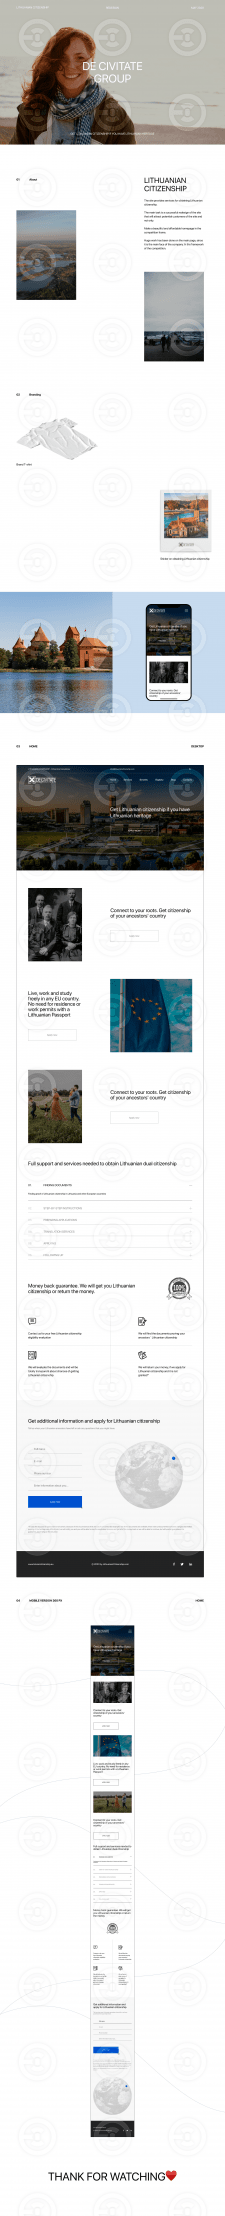 De Civitate Group ӏ Сайт + Адаптивв